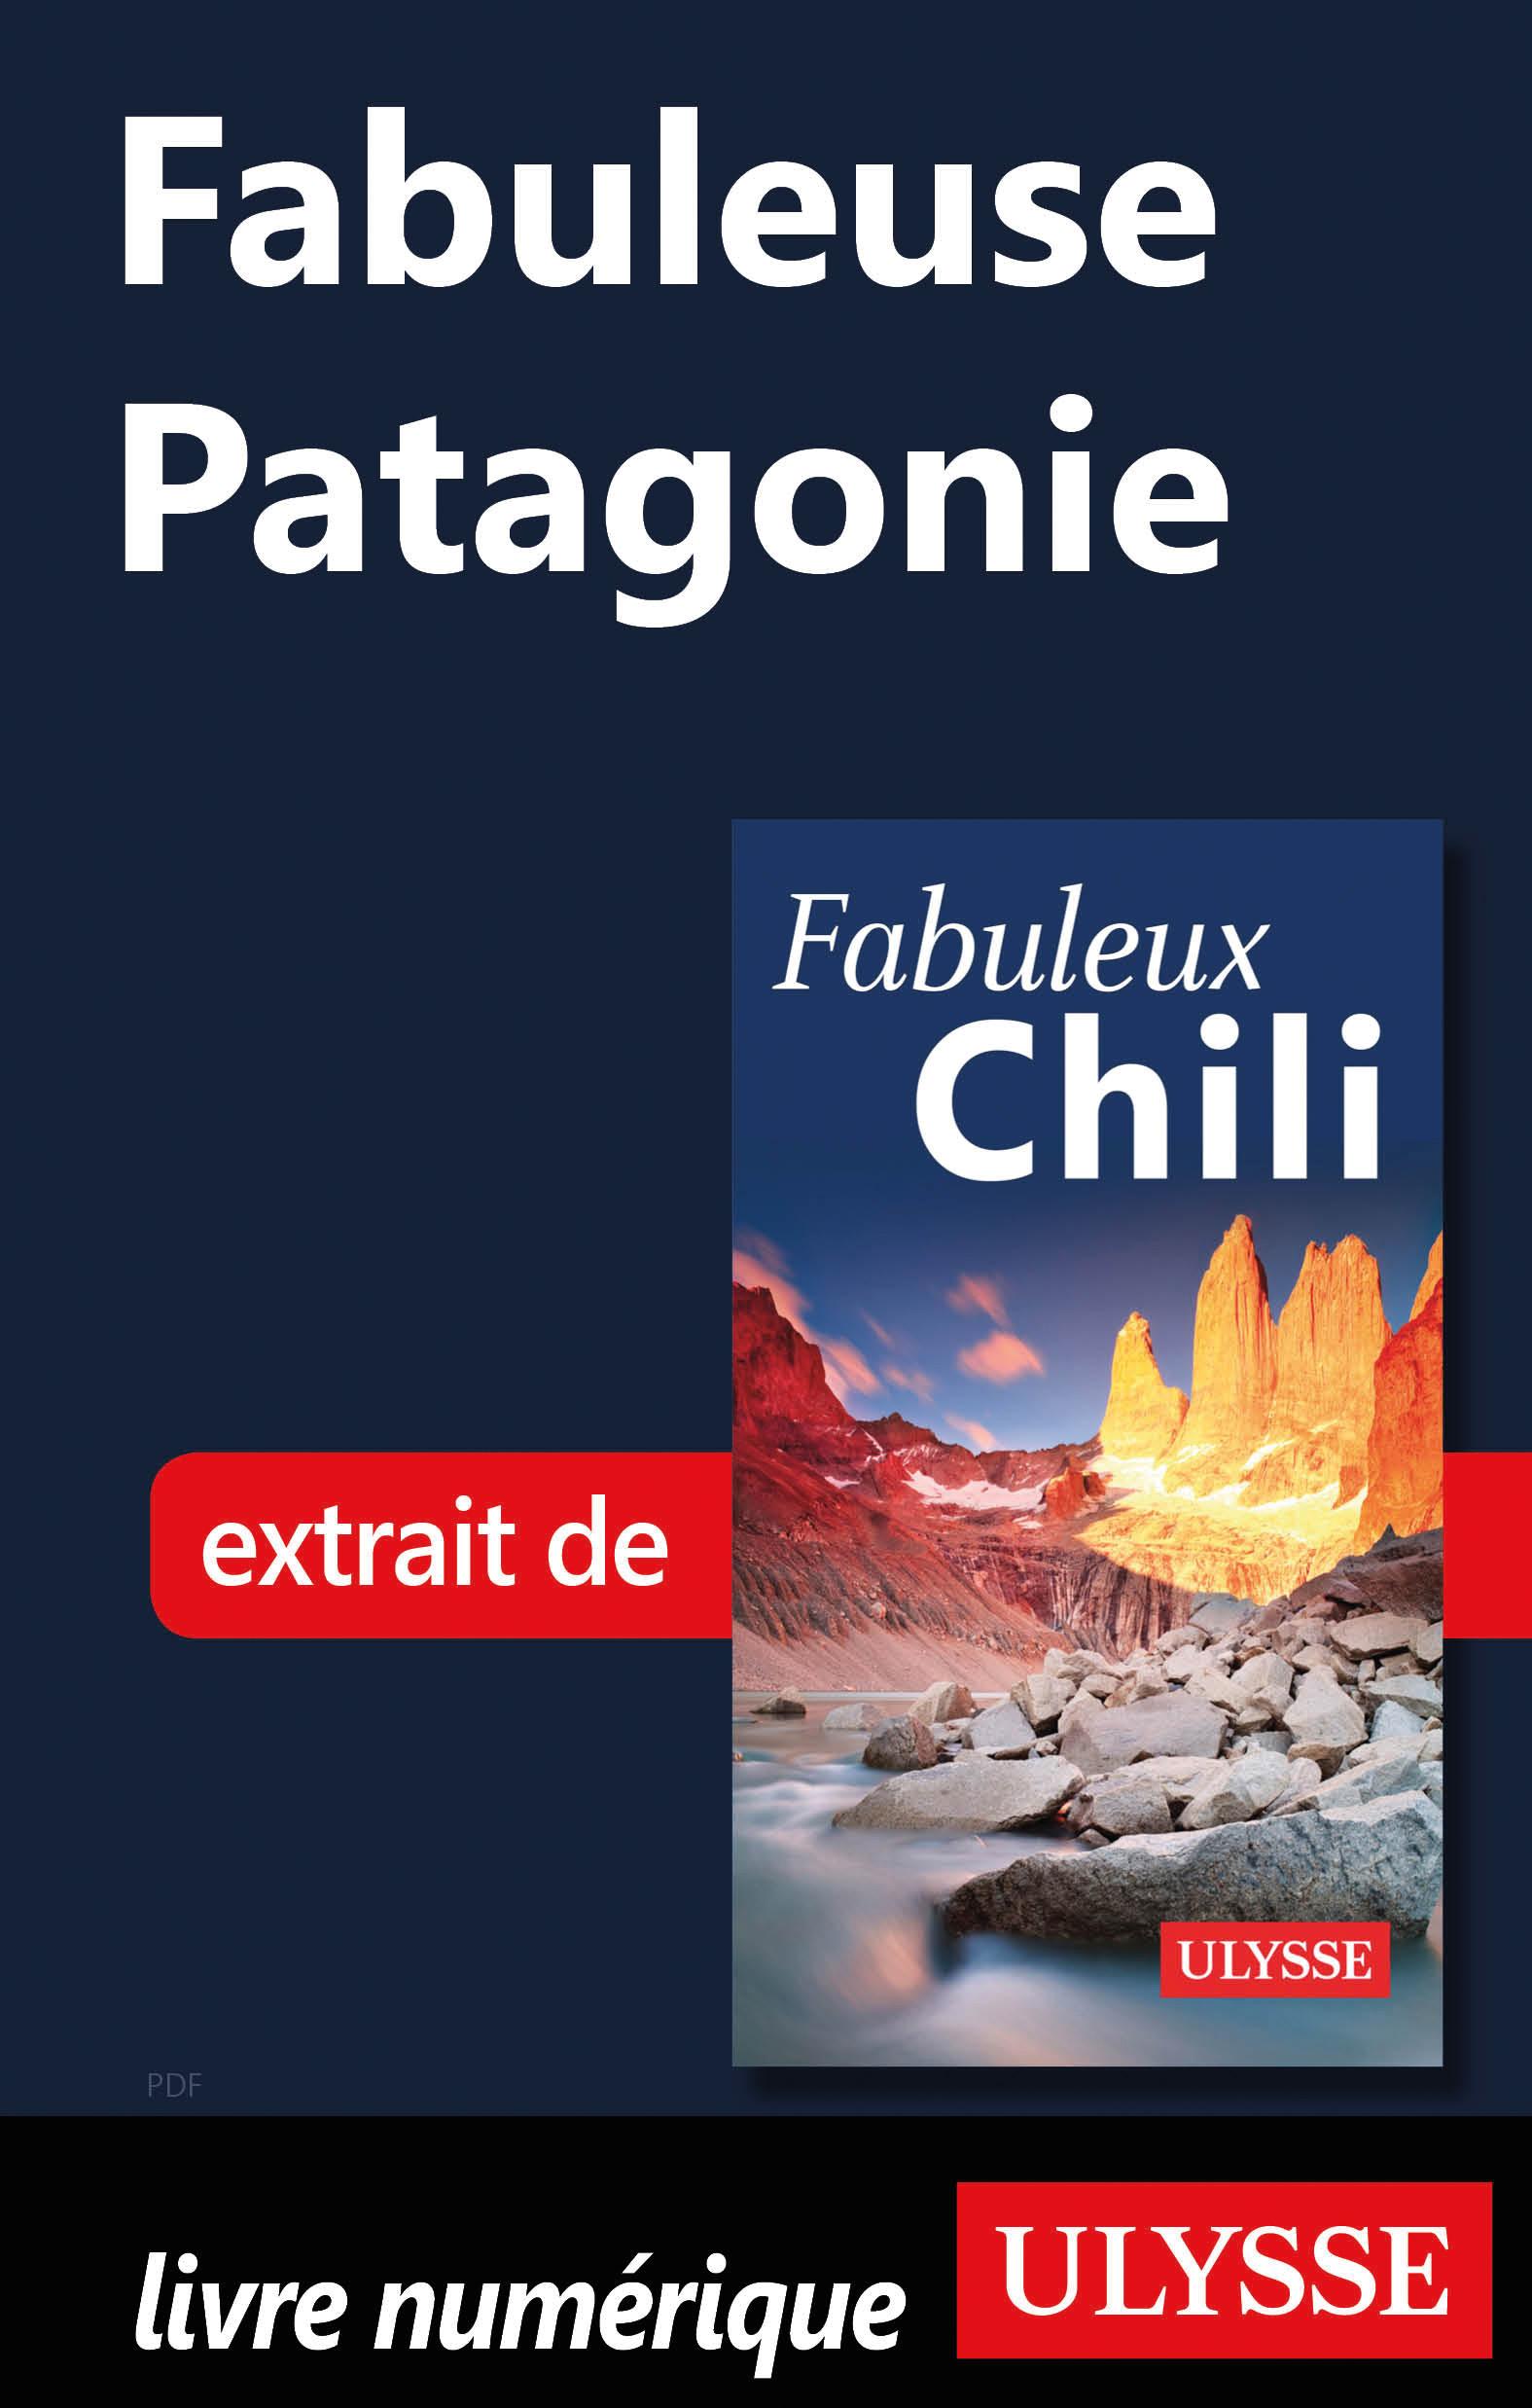 Fabuleuse Patagonie (Chili)